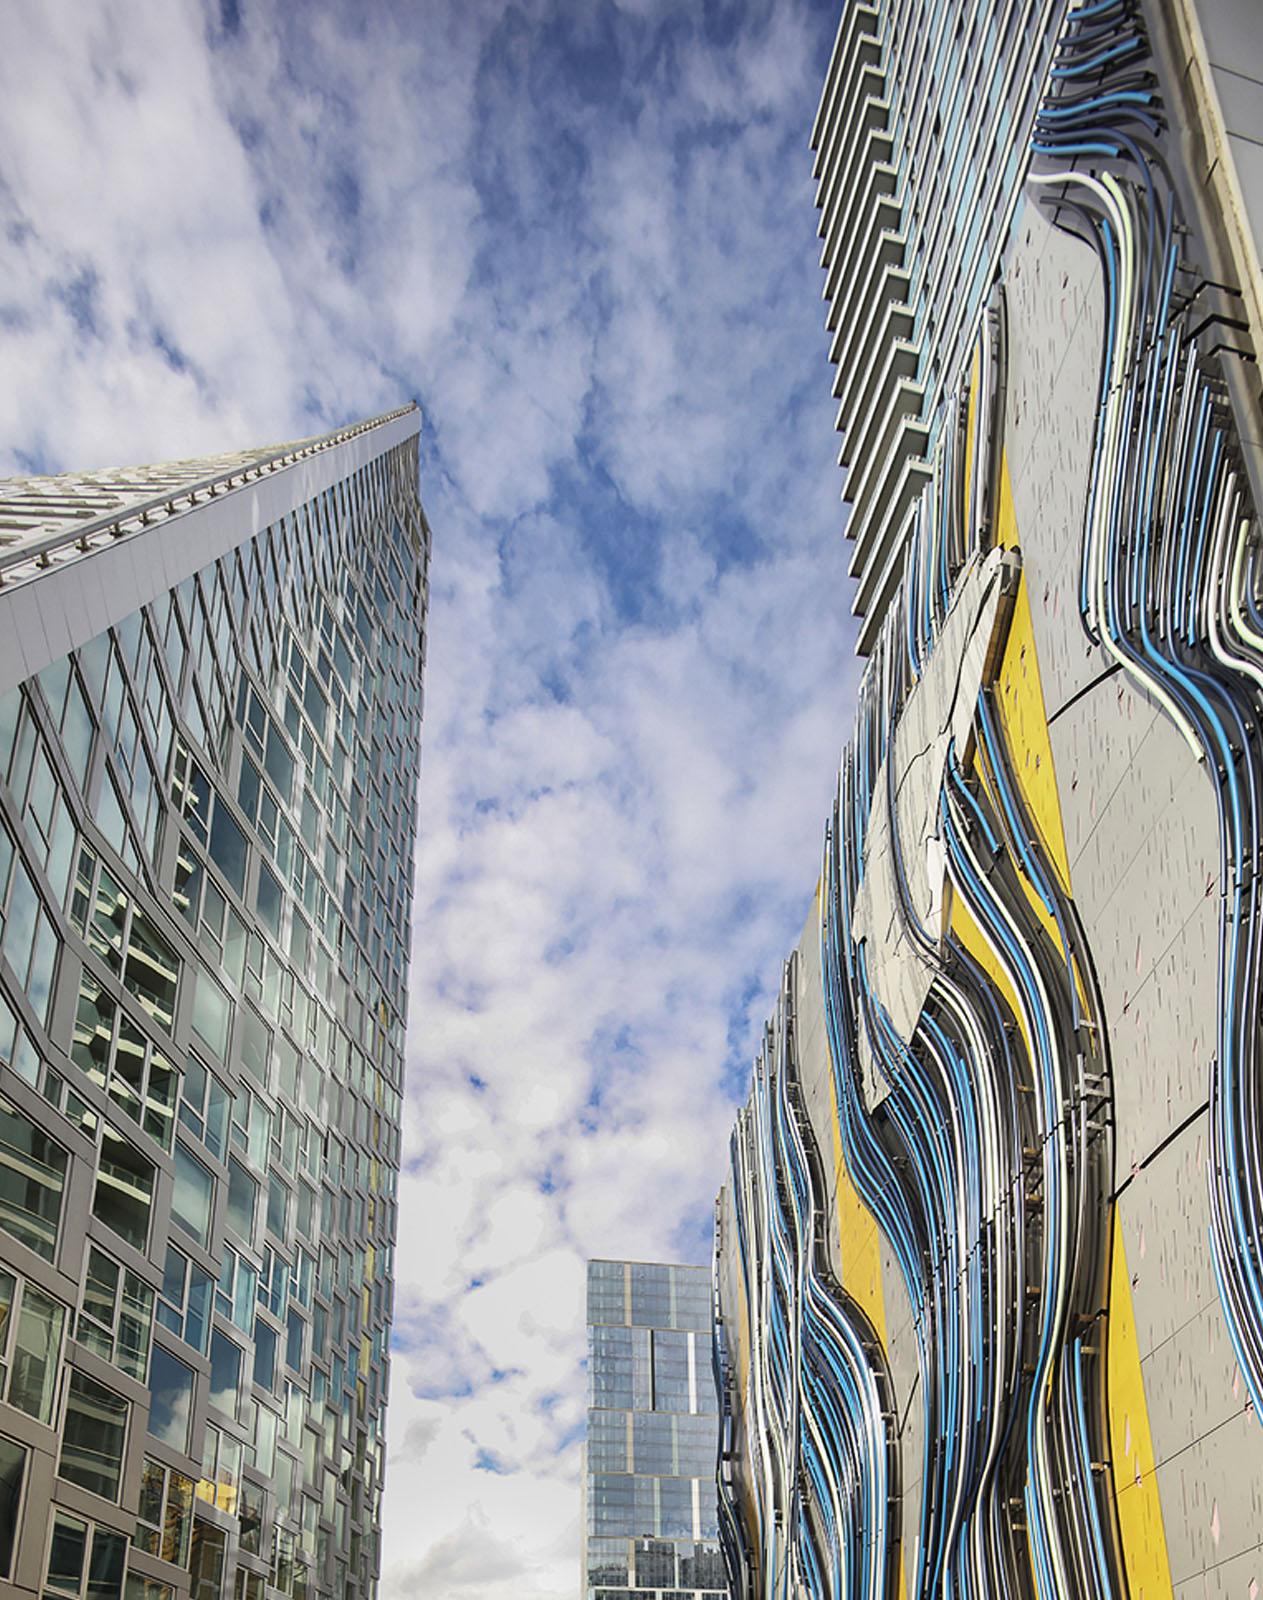 flows-two-ways-stephen-glassman-studio-durst-bjarke-ingels-via-revista-mexico-design-1